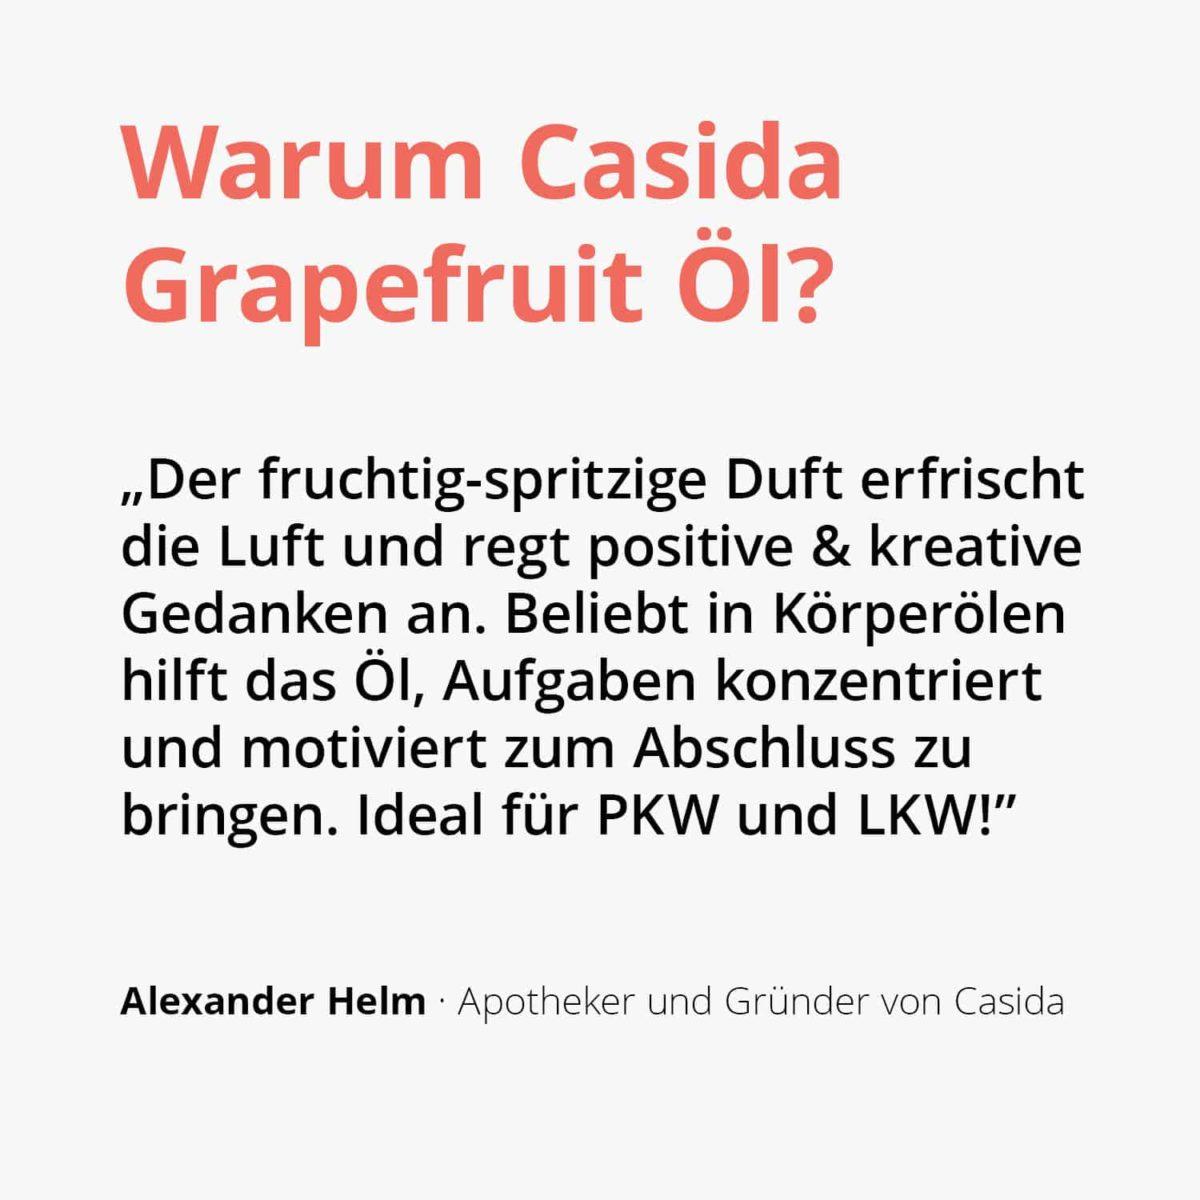 Casida Grapefruit Öl - 10 ml citrus paradisi naturrein 17377192 PZN Apotheke ätherische Öle Diffuser Celluite Hautpflege adstringierend2